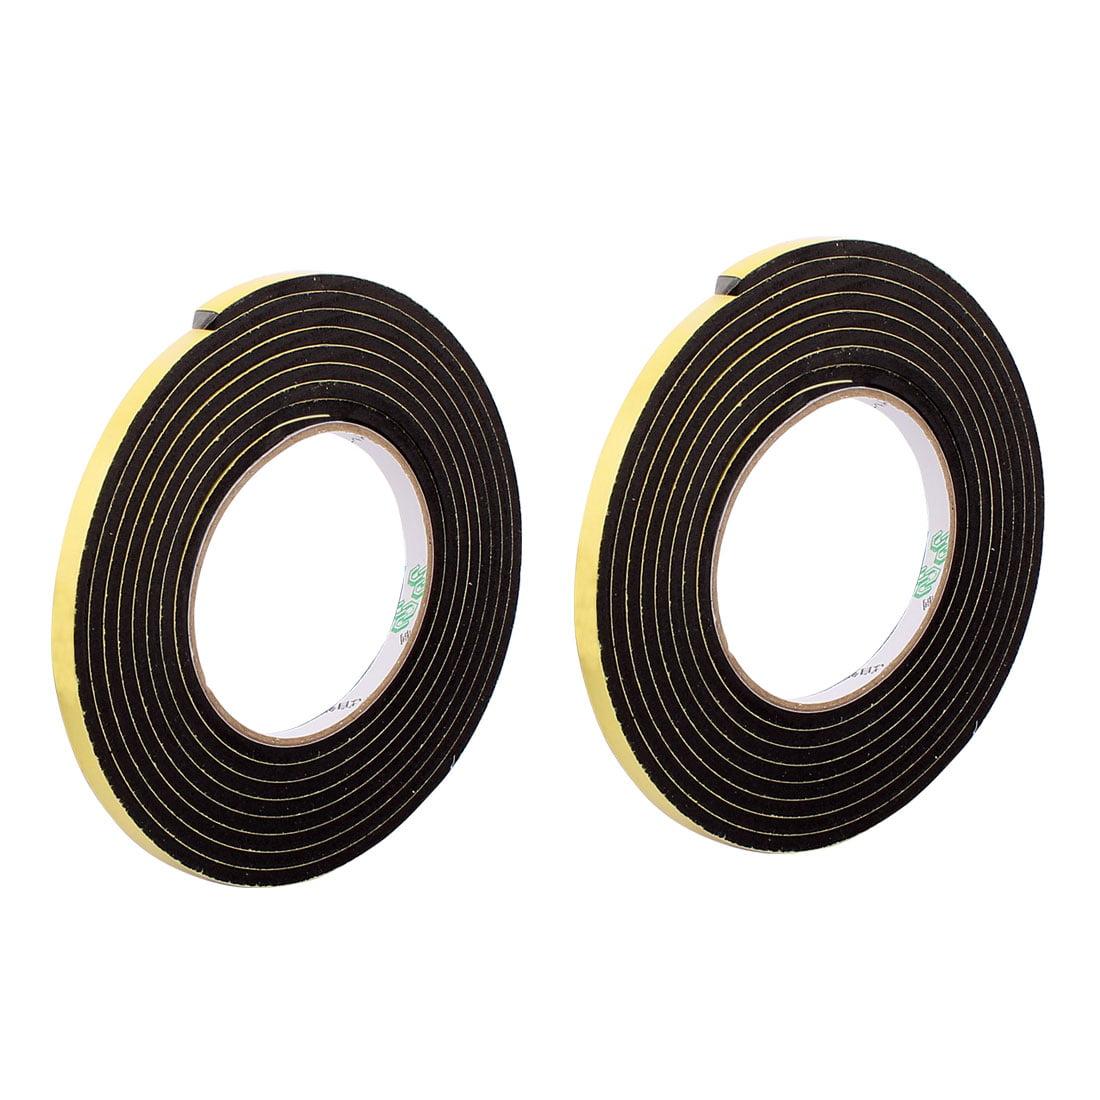 2pcs Black 0.6CM Wide 4M Length 3MM Thick Single Sided Shockproof Sponge Tape